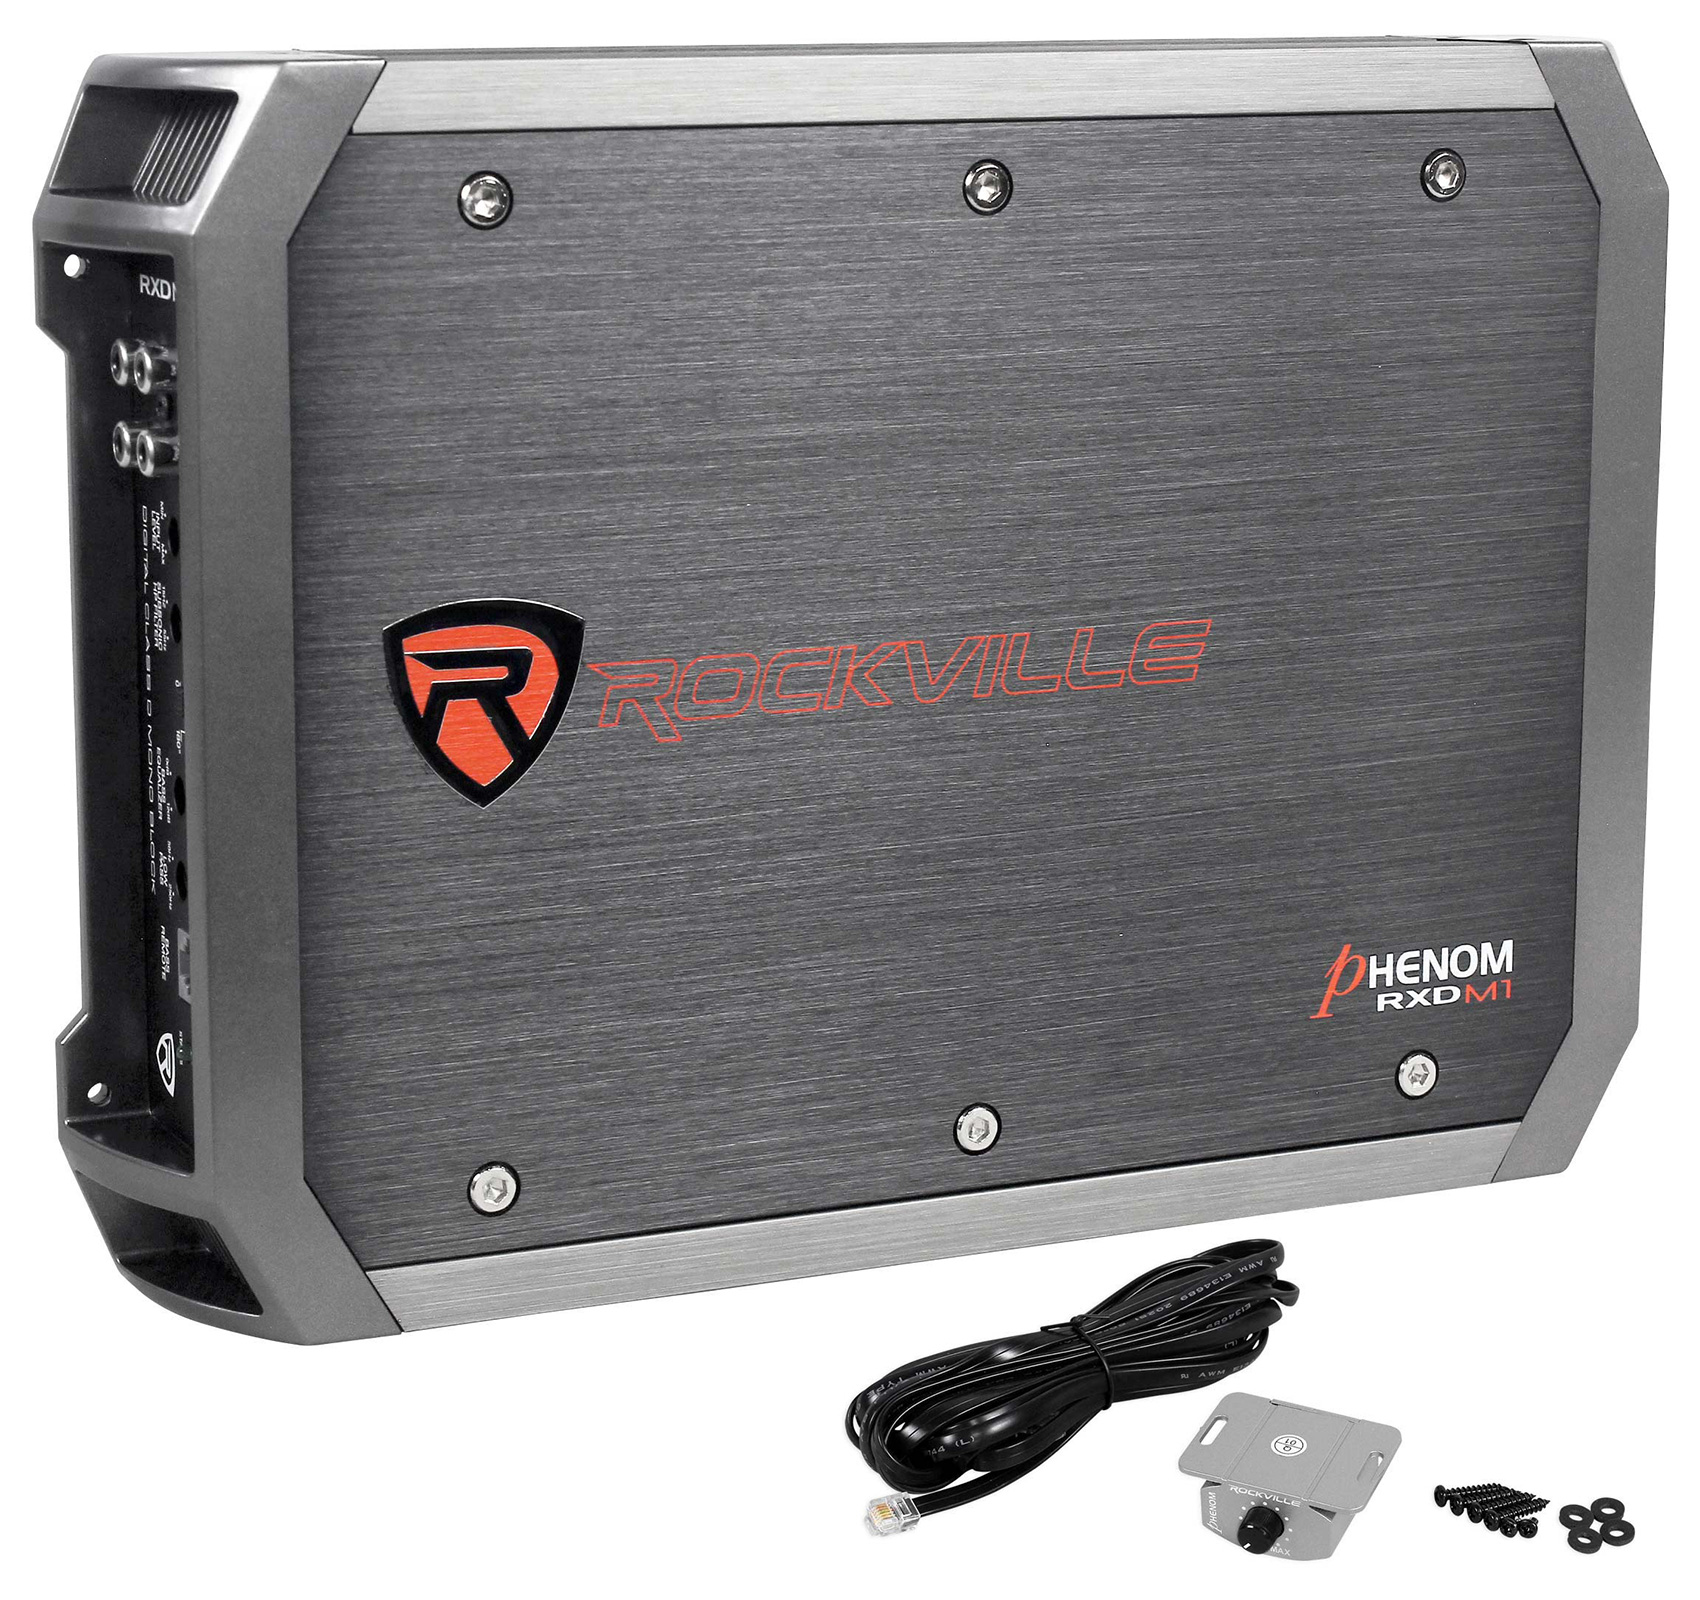 "Rockville 1000w Mono Amplifier For (2) Rockford Fosgate P2D4-10 10"" Subwoofers"